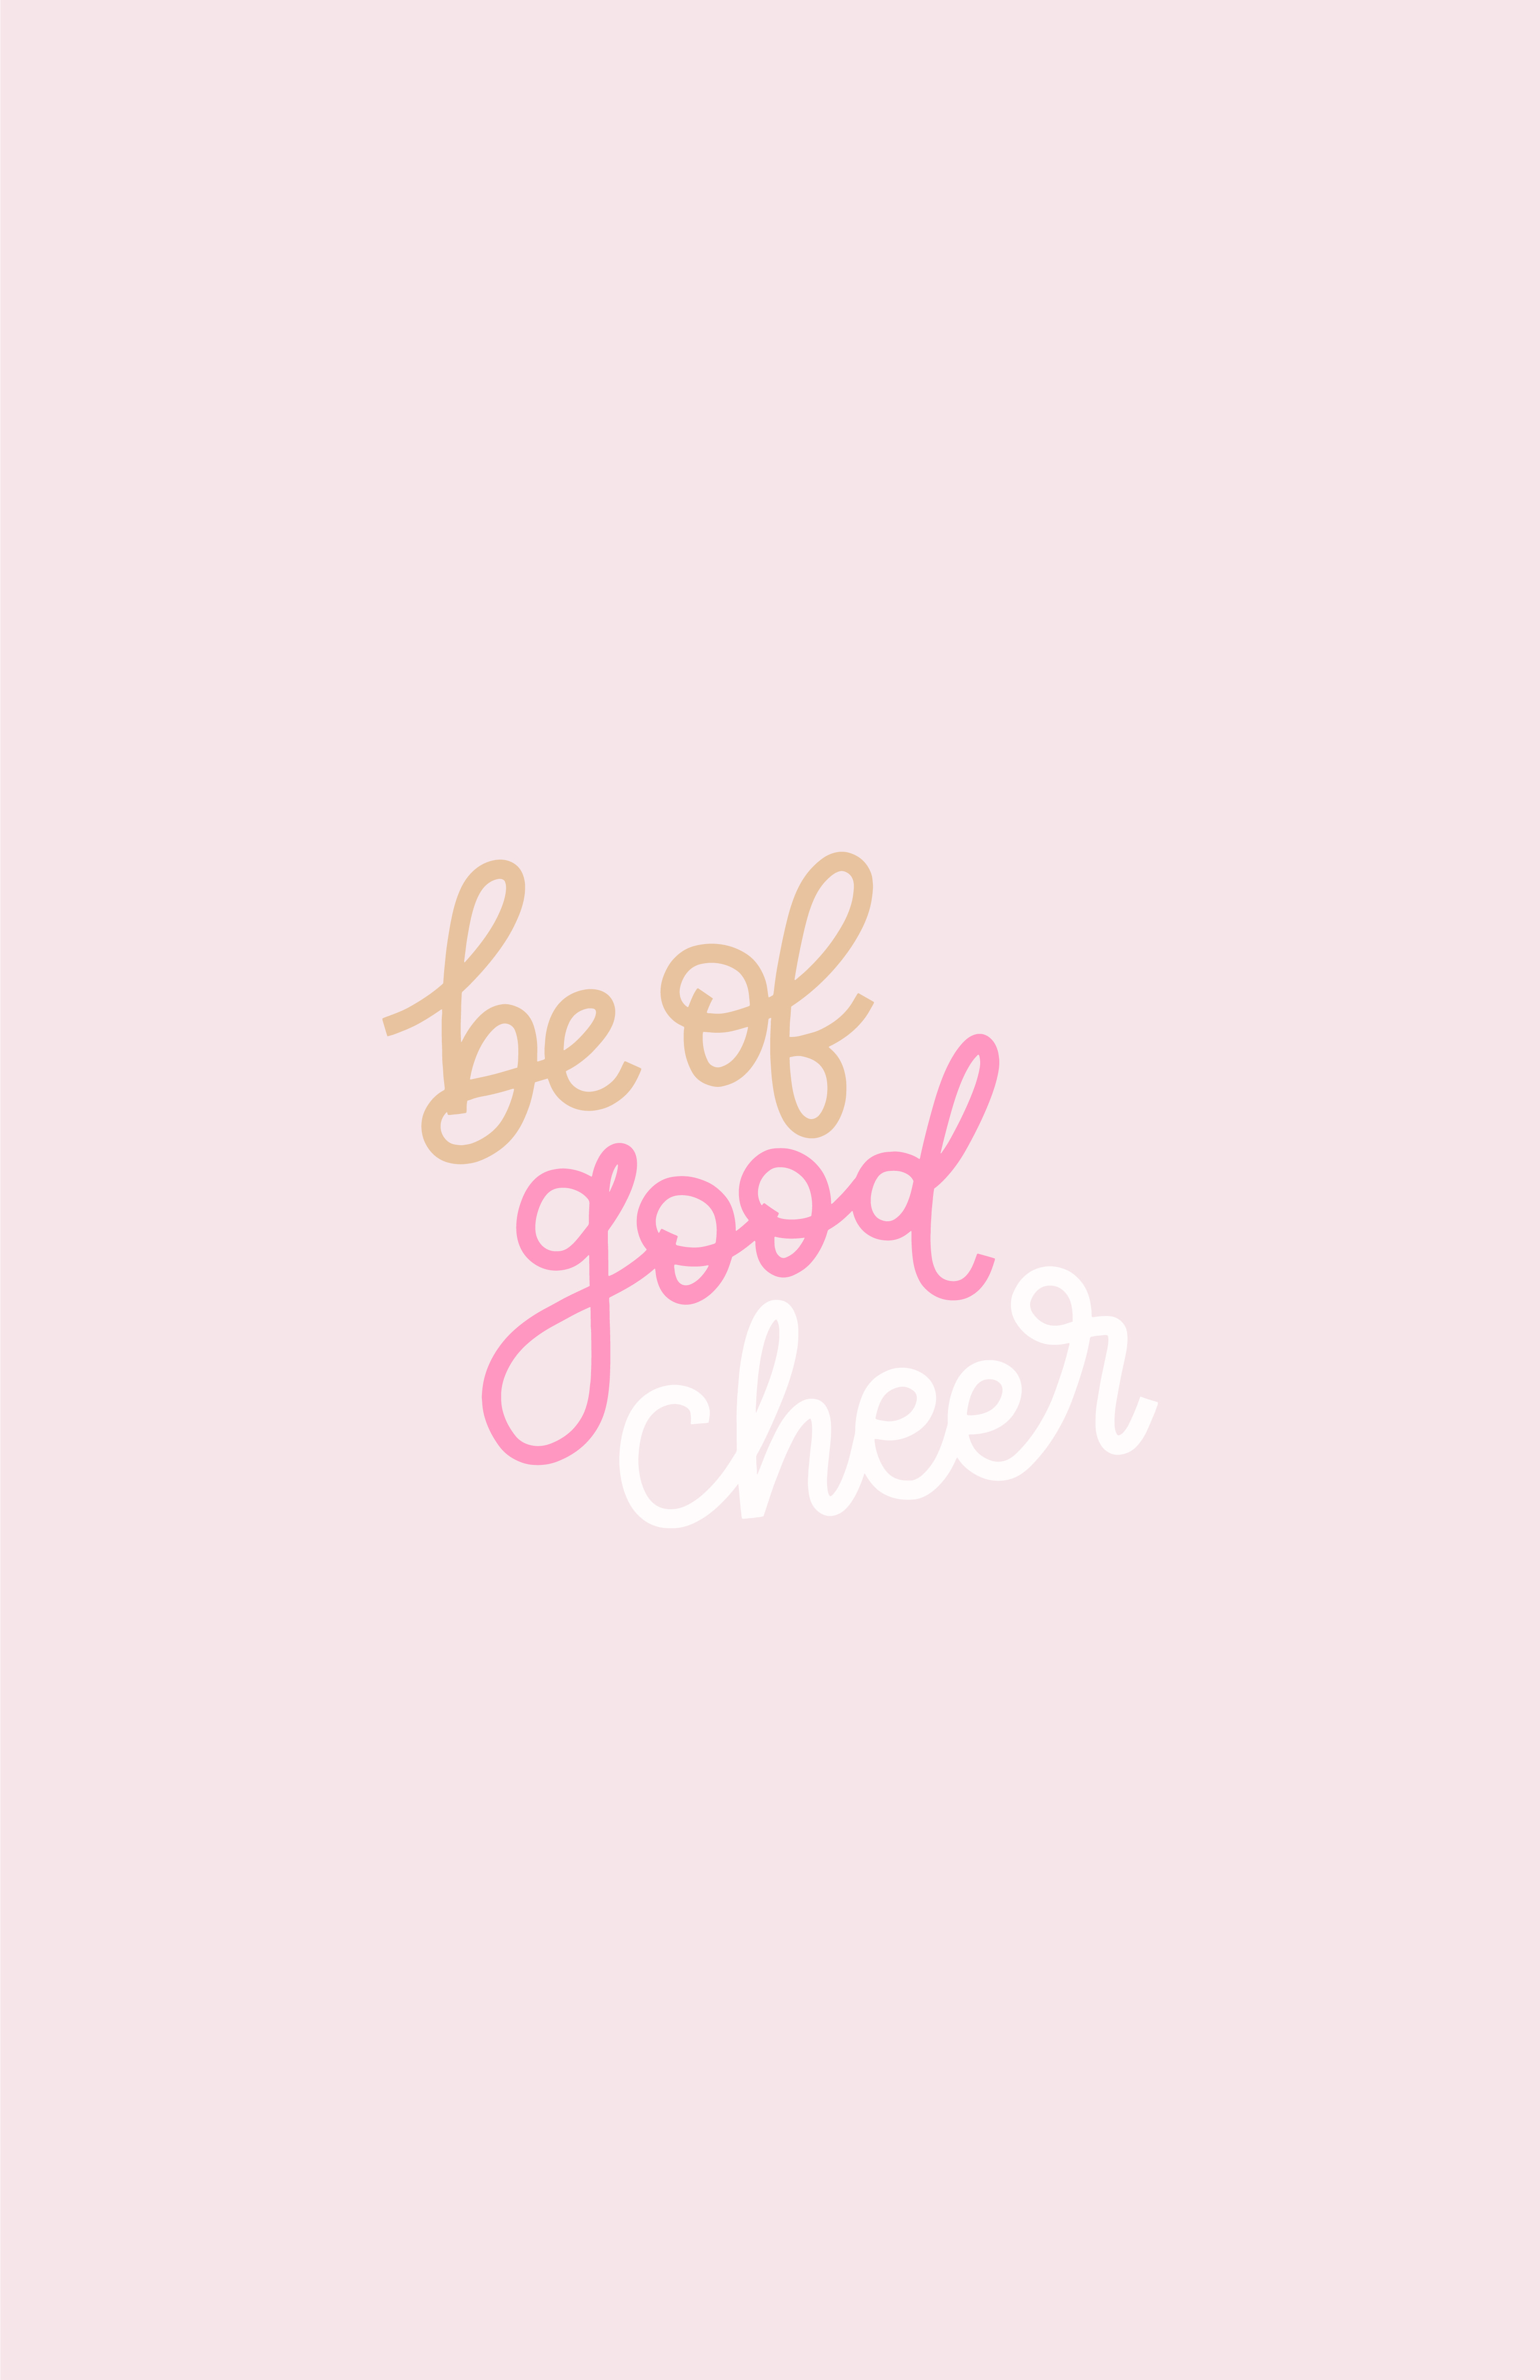 Prints By Rachael Be Of Good Cheer Free Art Free Wallpaper Good Cheer